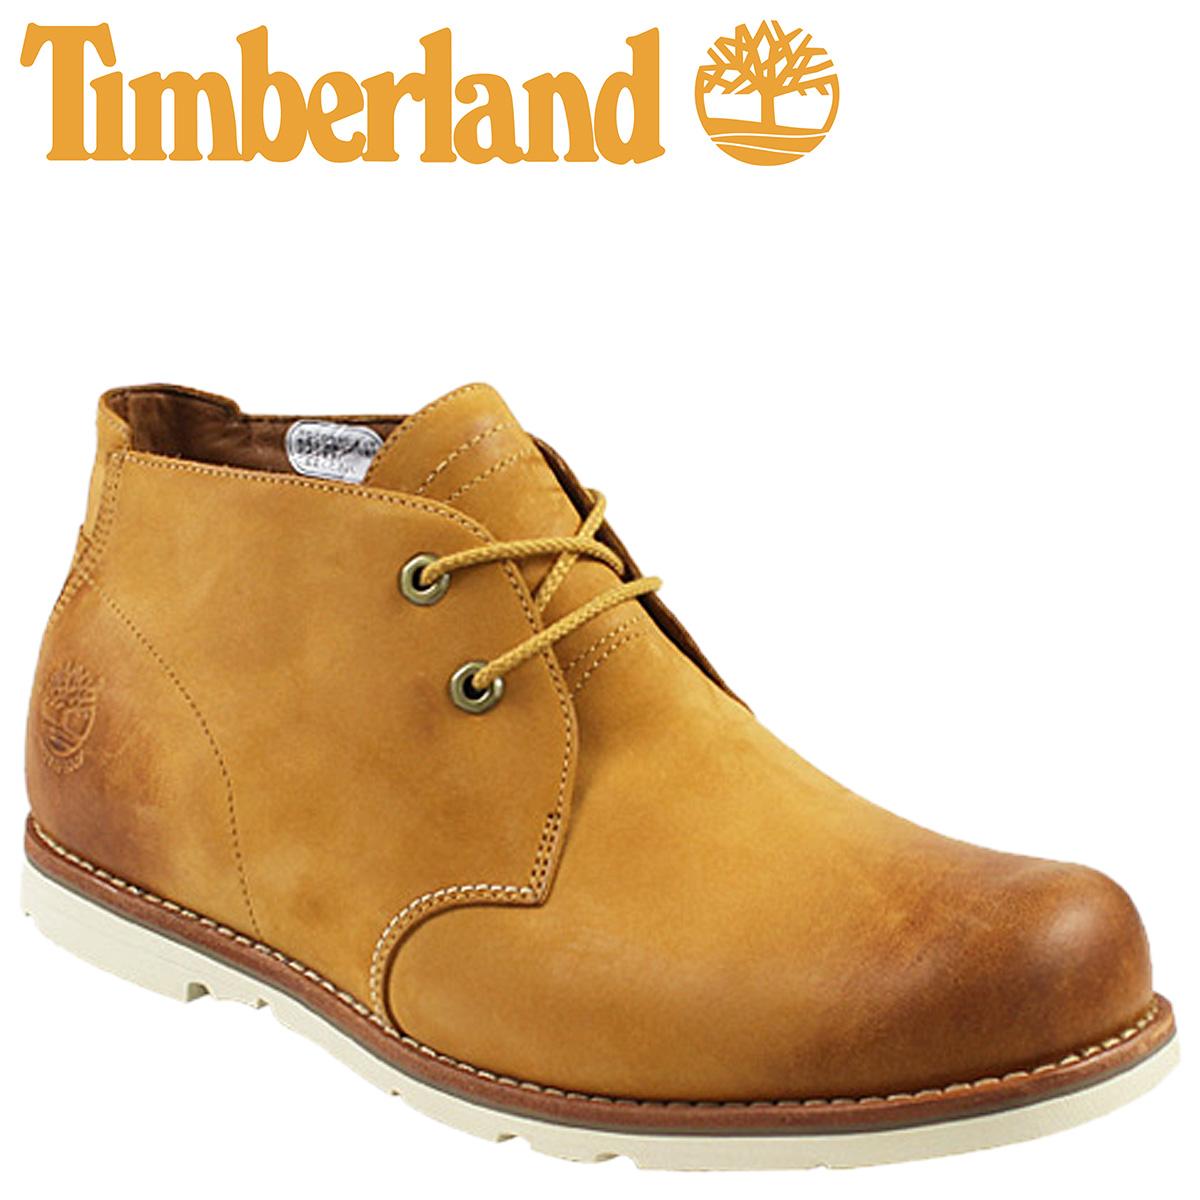 Timberland Earthkeepers Rugged Lt Plain To Chukka Boots Ek Toe Nubuck